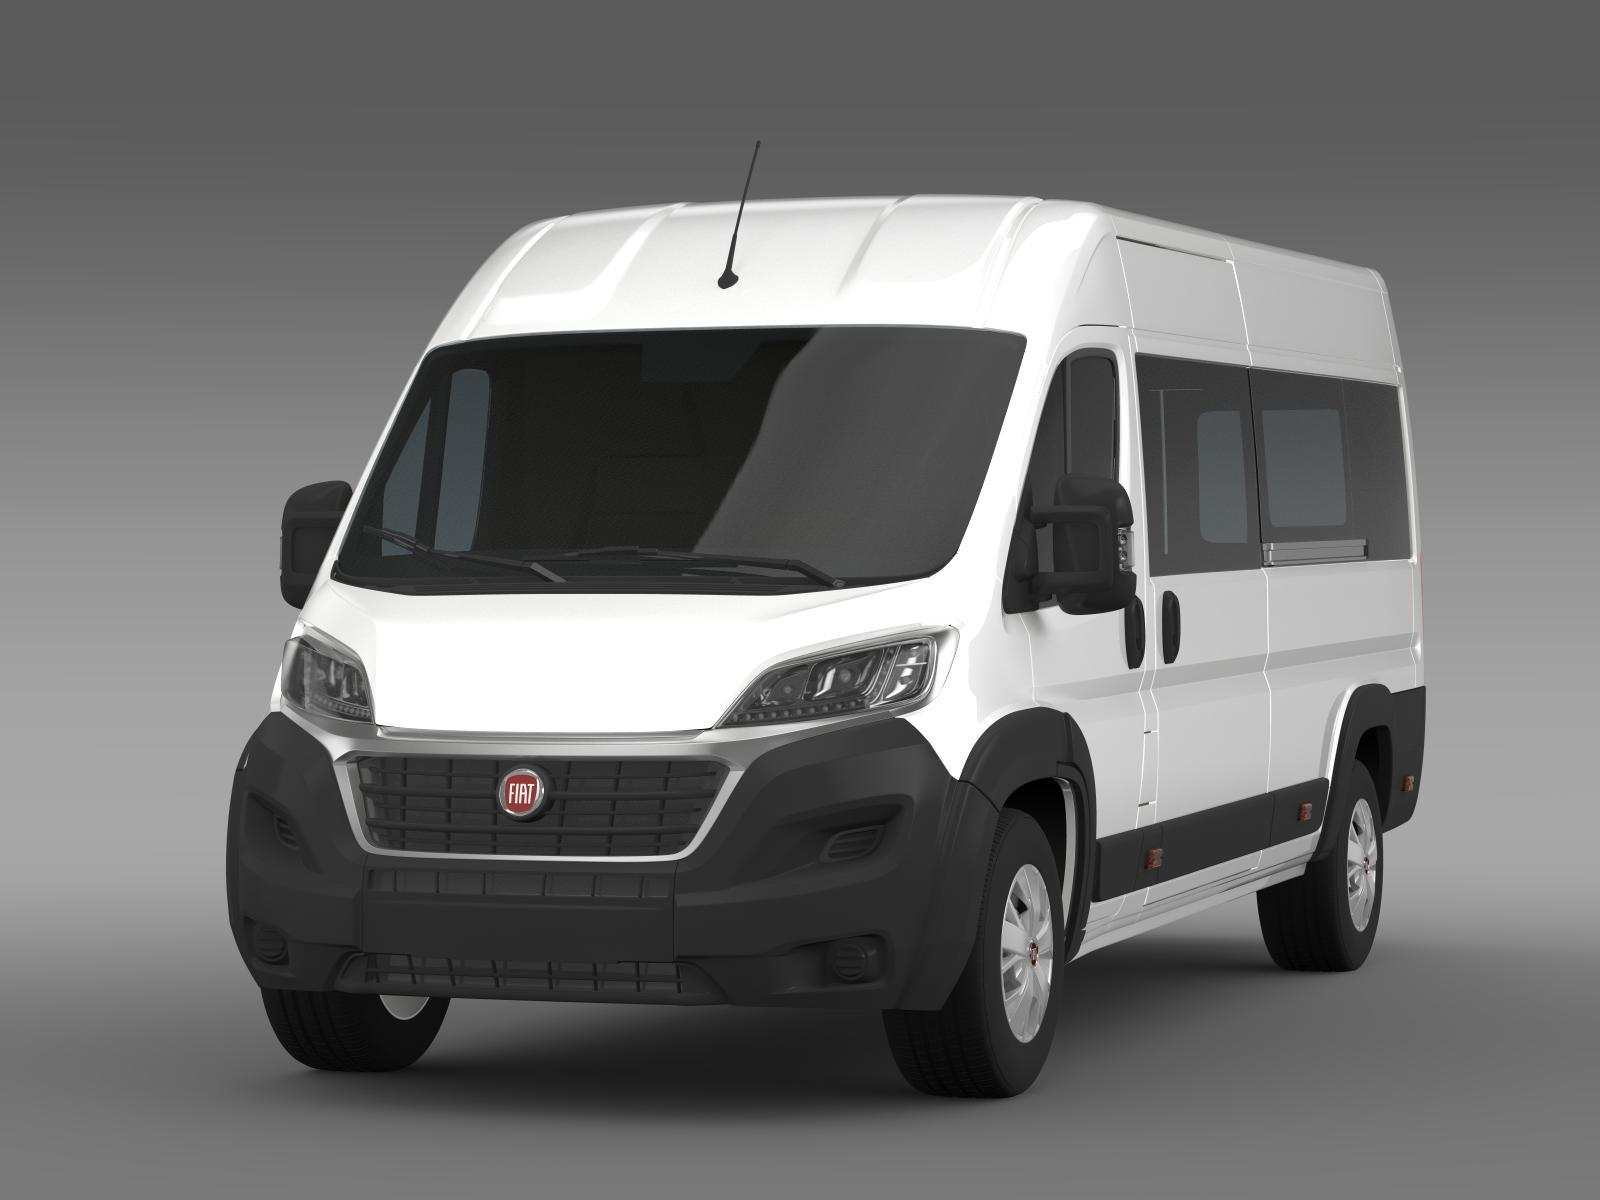 fiat ducato maxi minibus 2015 by creator 3d 3docean. Black Bedroom Furniture Sets. Home Design Ideas